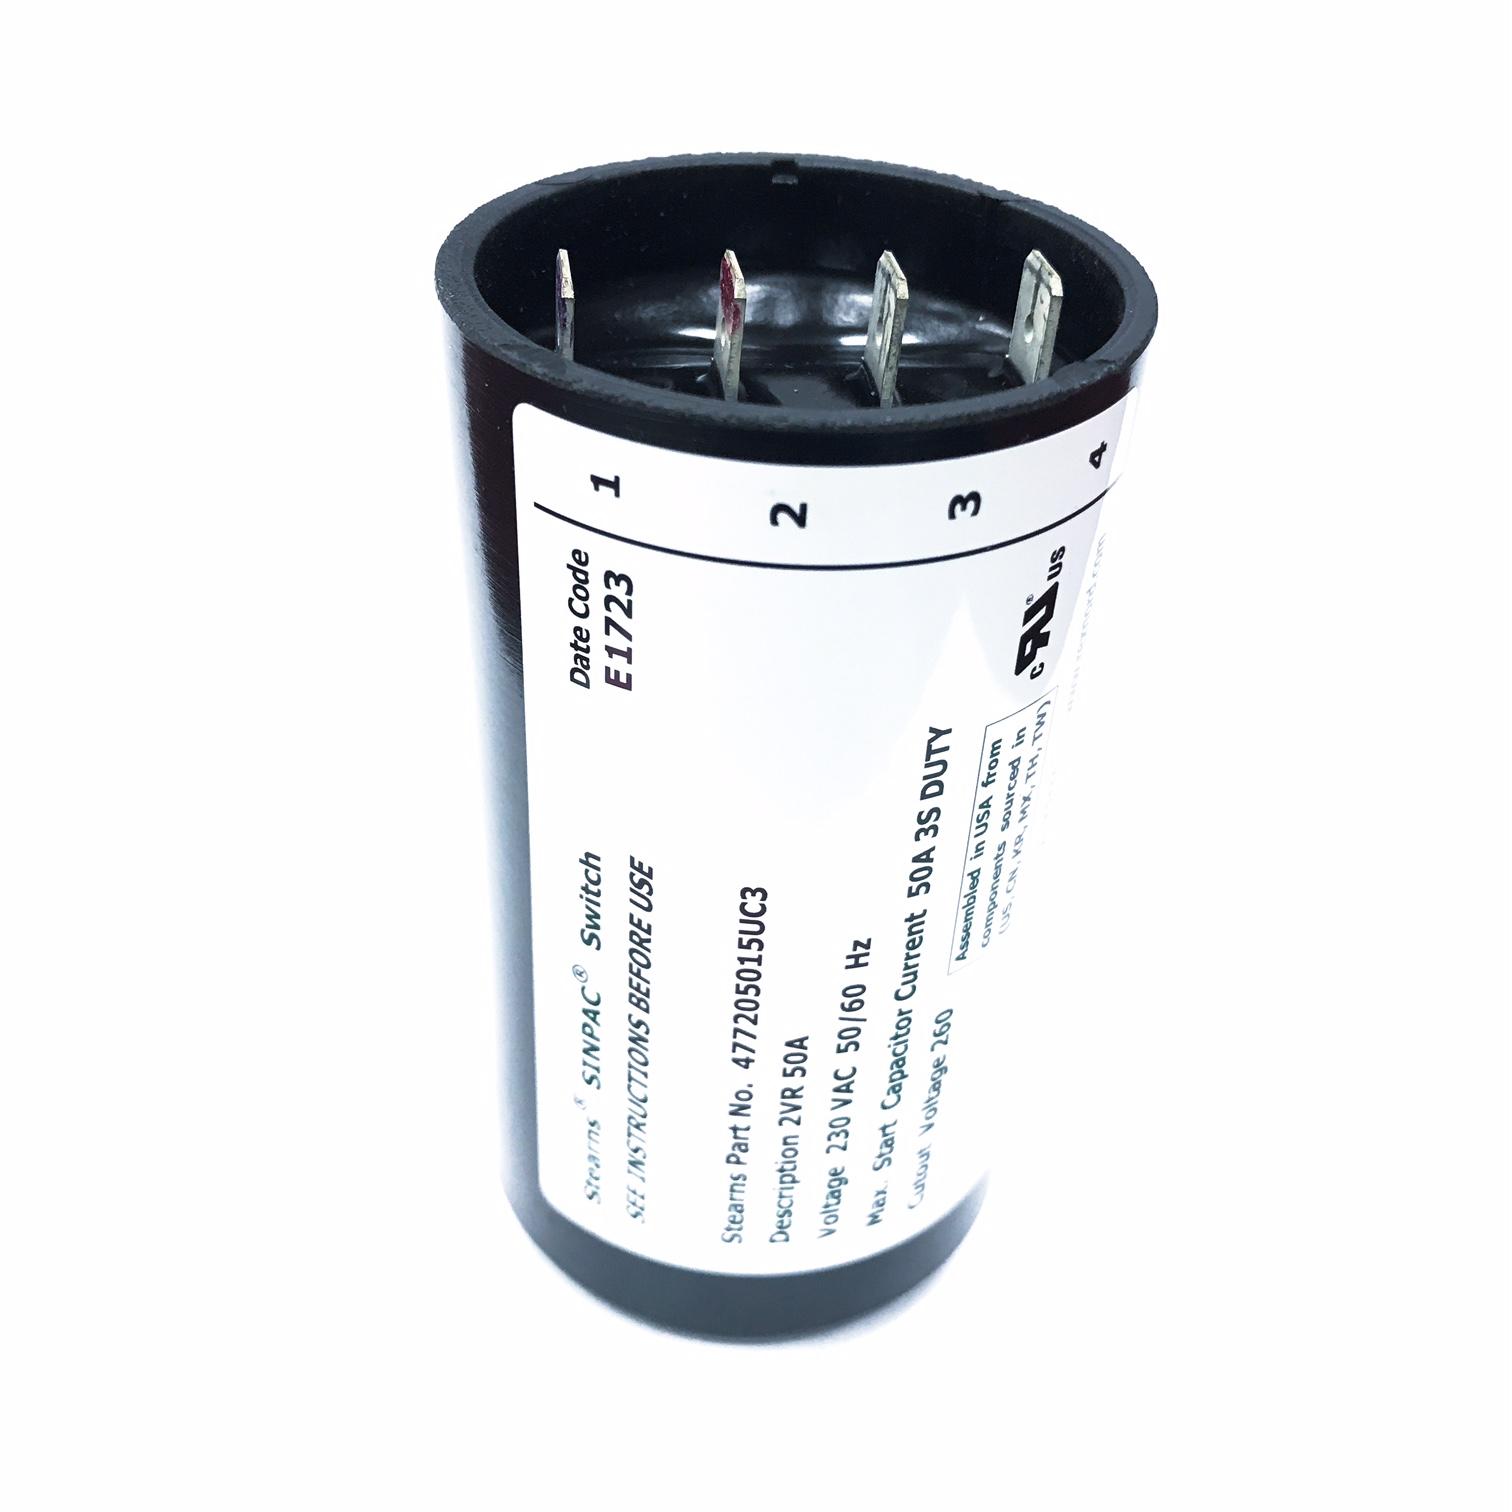 medium resolution of wiring diagram on kirby vacuum switch kirby vacuum power www riccar vacuum replacement parts kirby vacuum